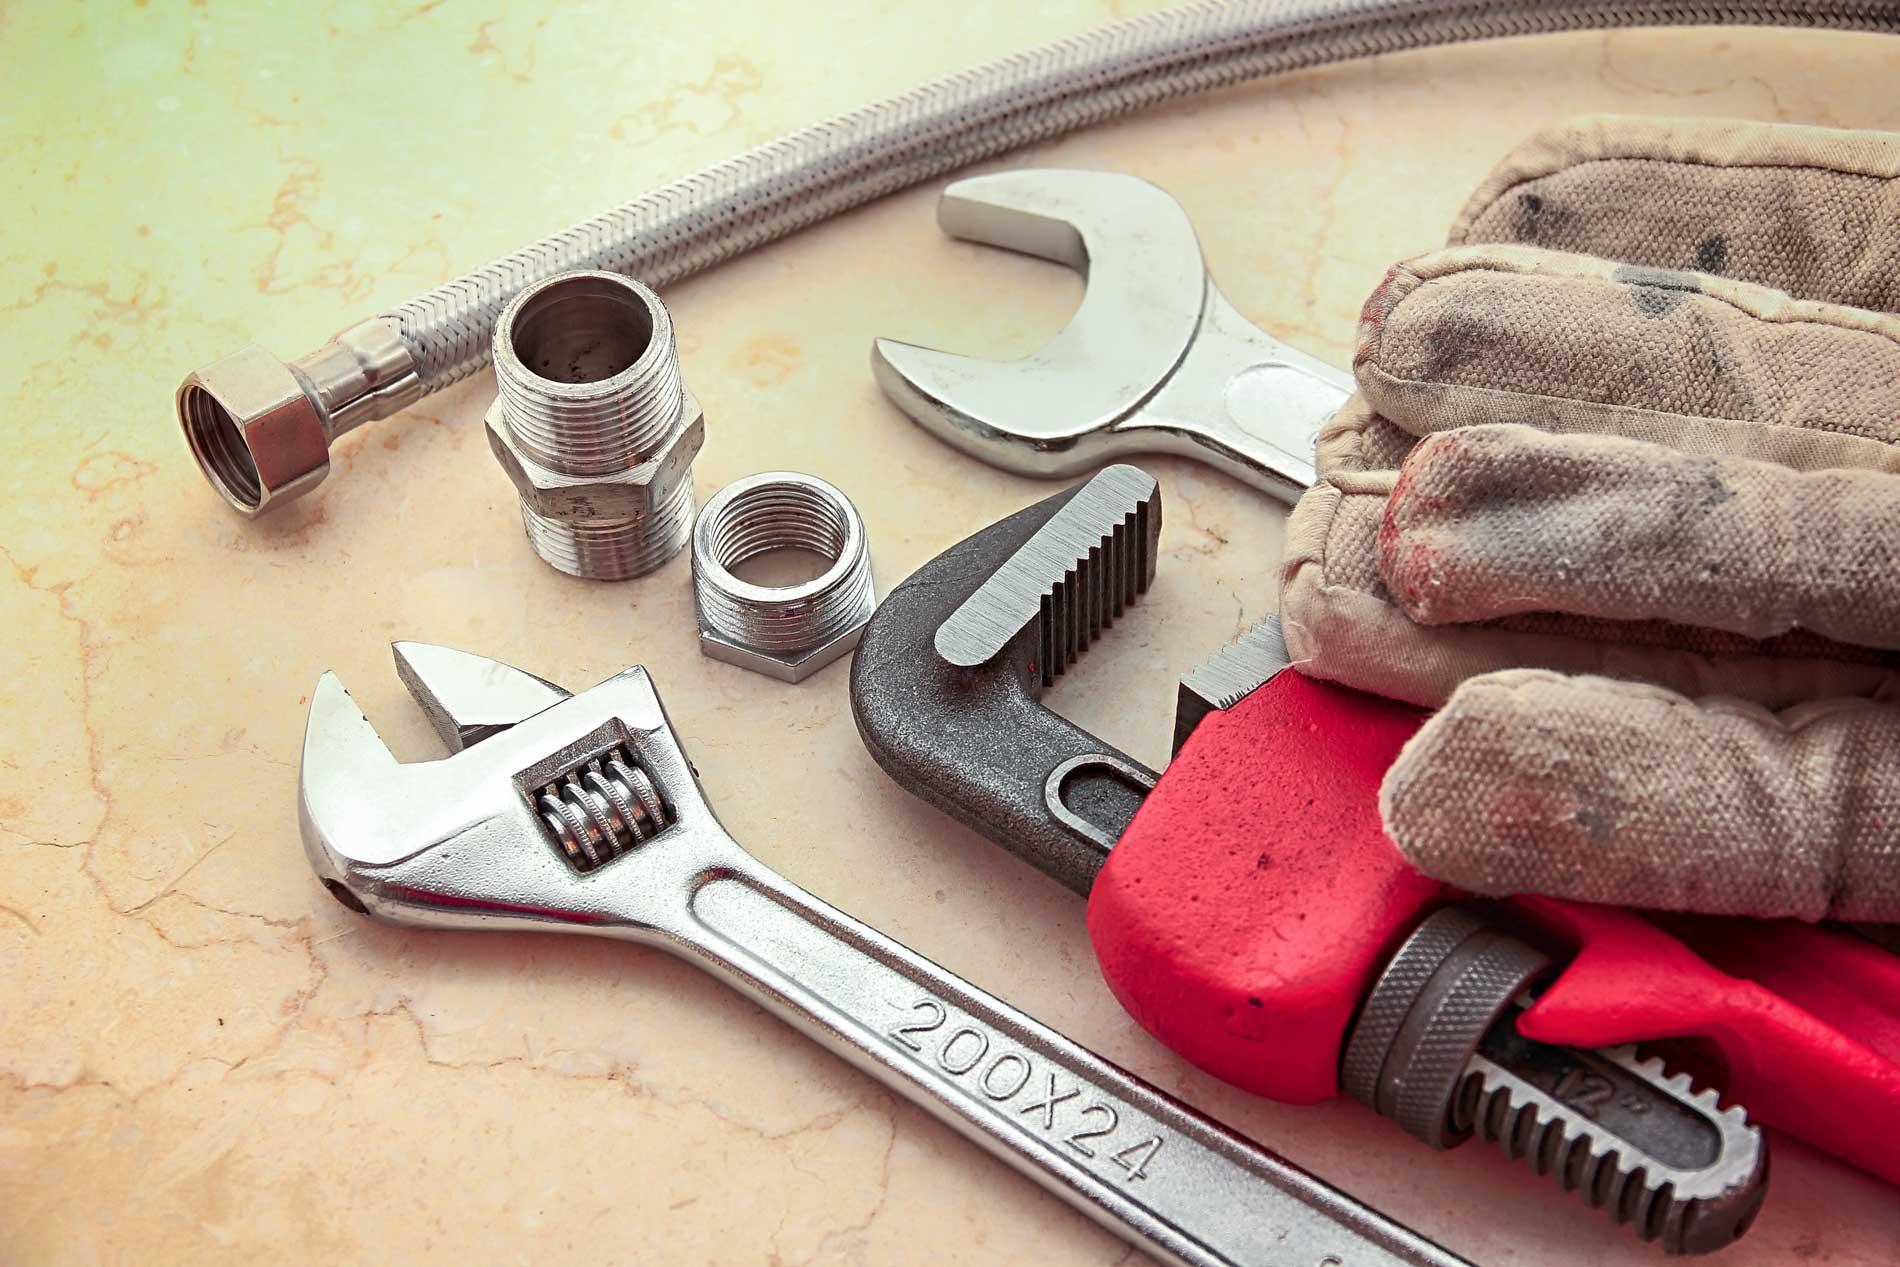 Strumenti professionali per lavori di idraulica